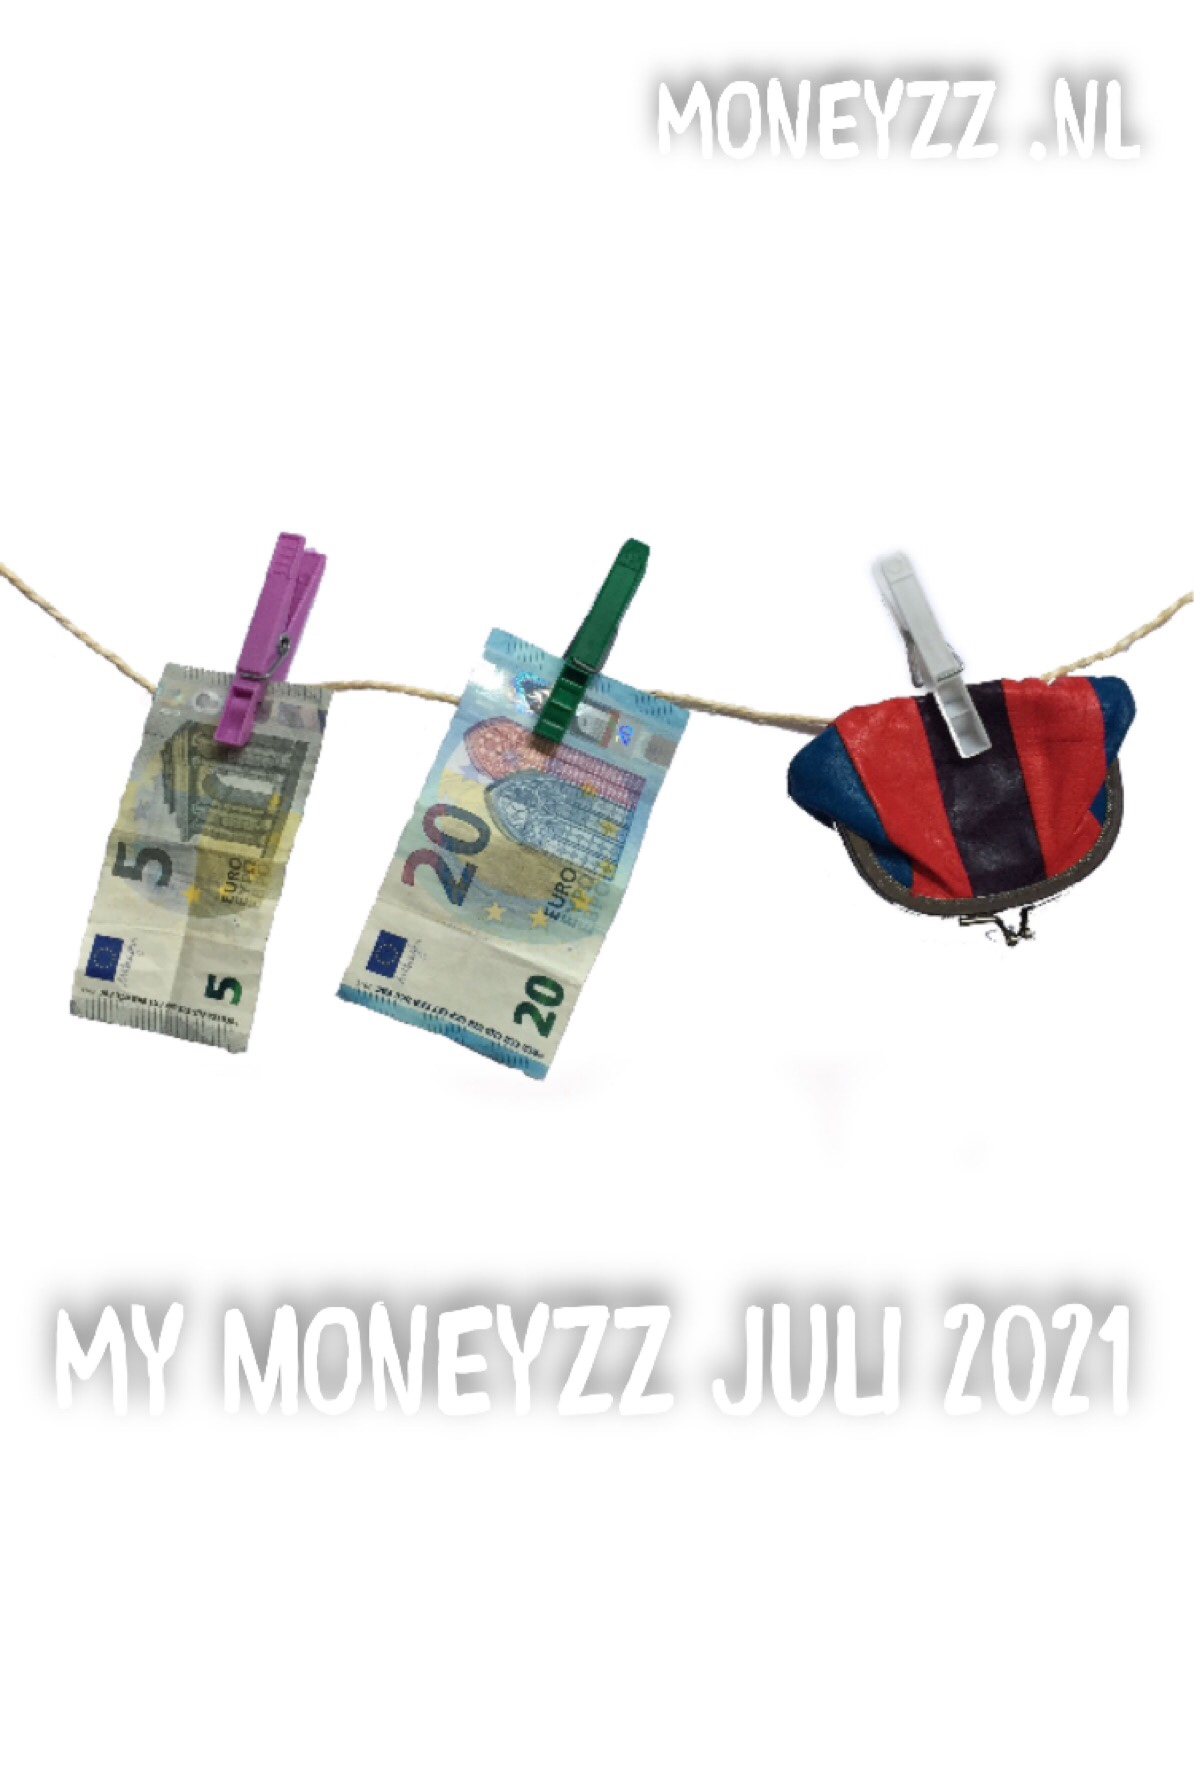 My moneyzz Juli 2021